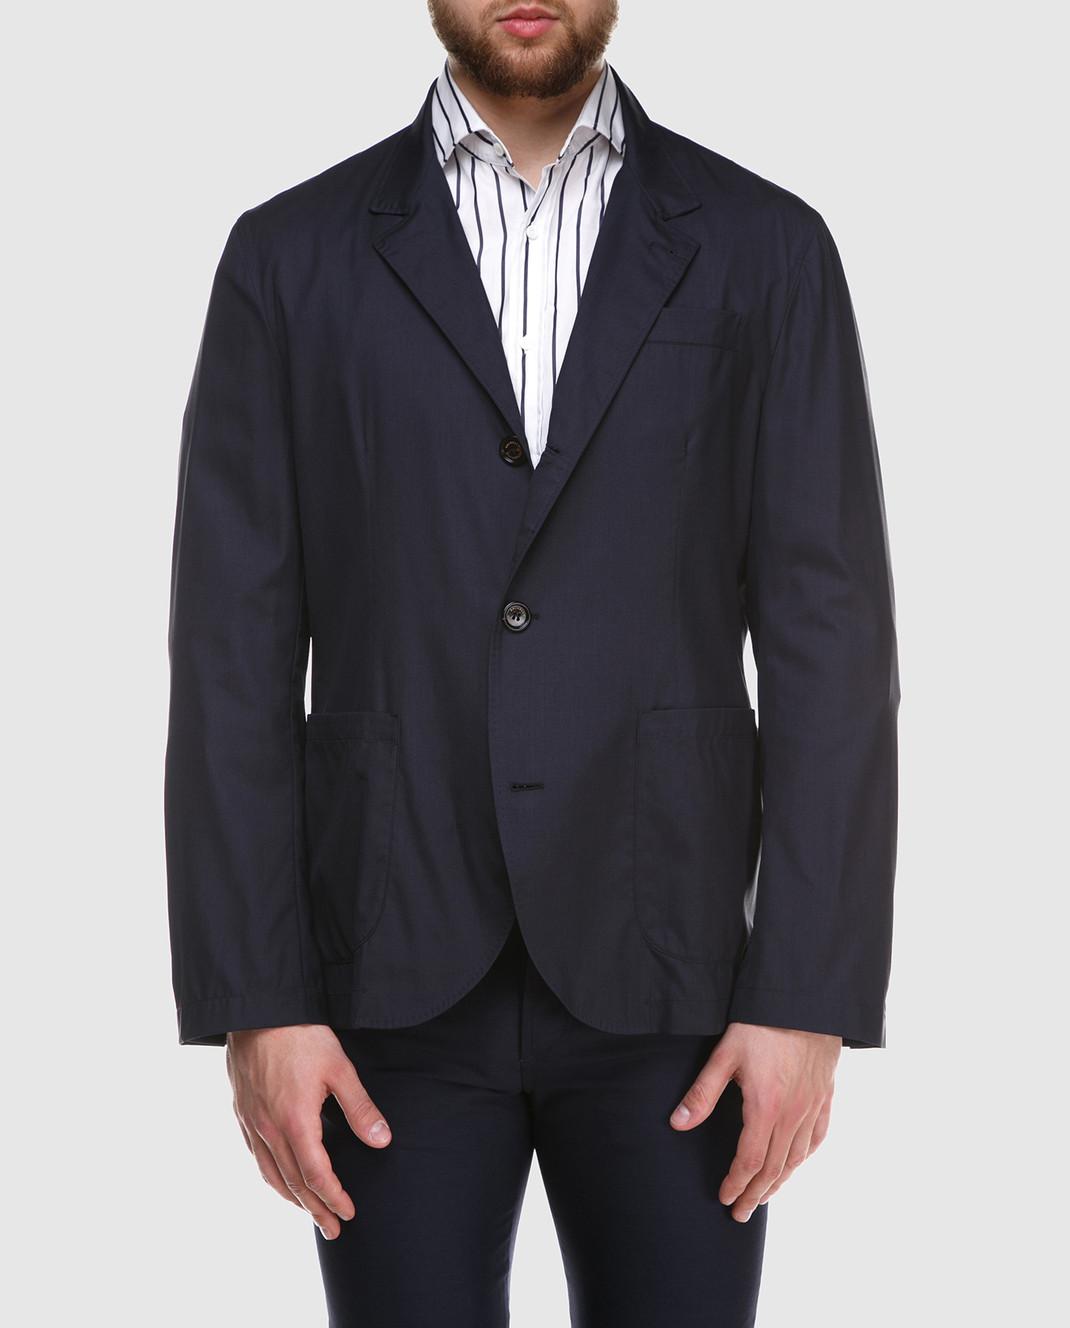 Brunello Cucinelli Темно-синий пиджак MH4626132 изображение 3